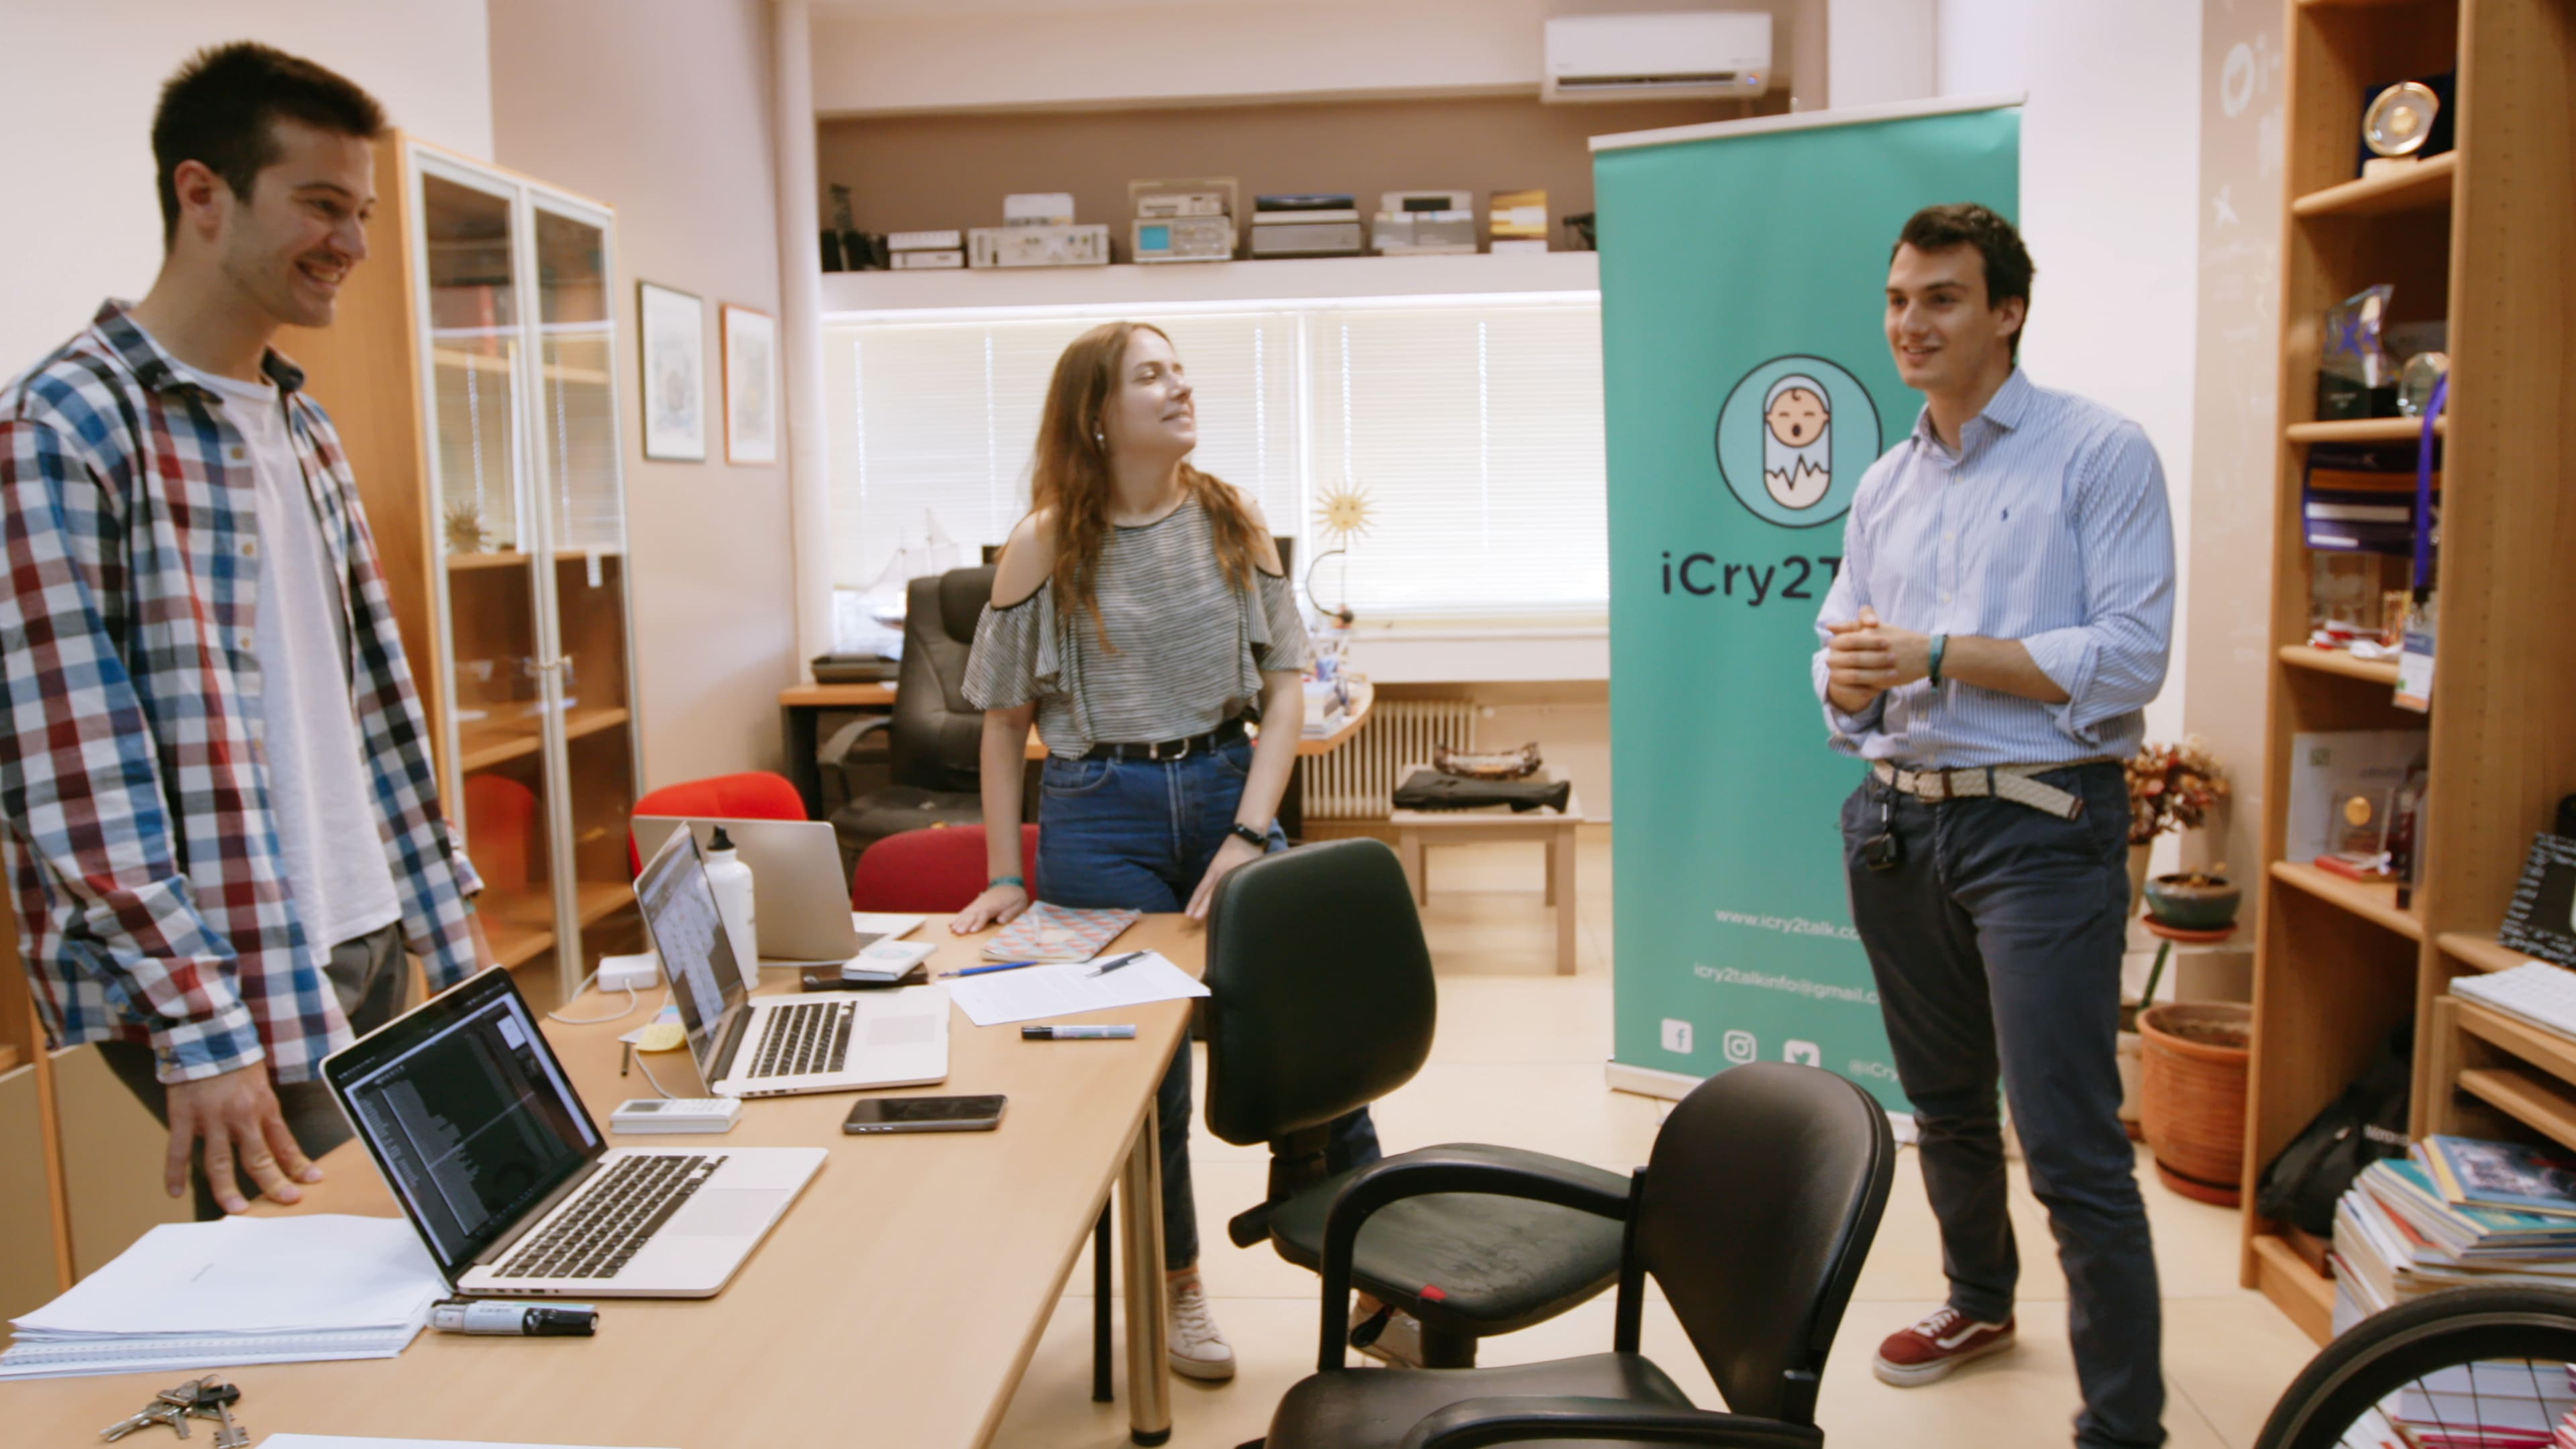 Thessaloniki, Greece - (L to R) iCry2Talk co-founders Andreas Loutzidis, Anastasia Ntracha and Jason Hadzikostas. (Credit: Future of Work Film Inc)